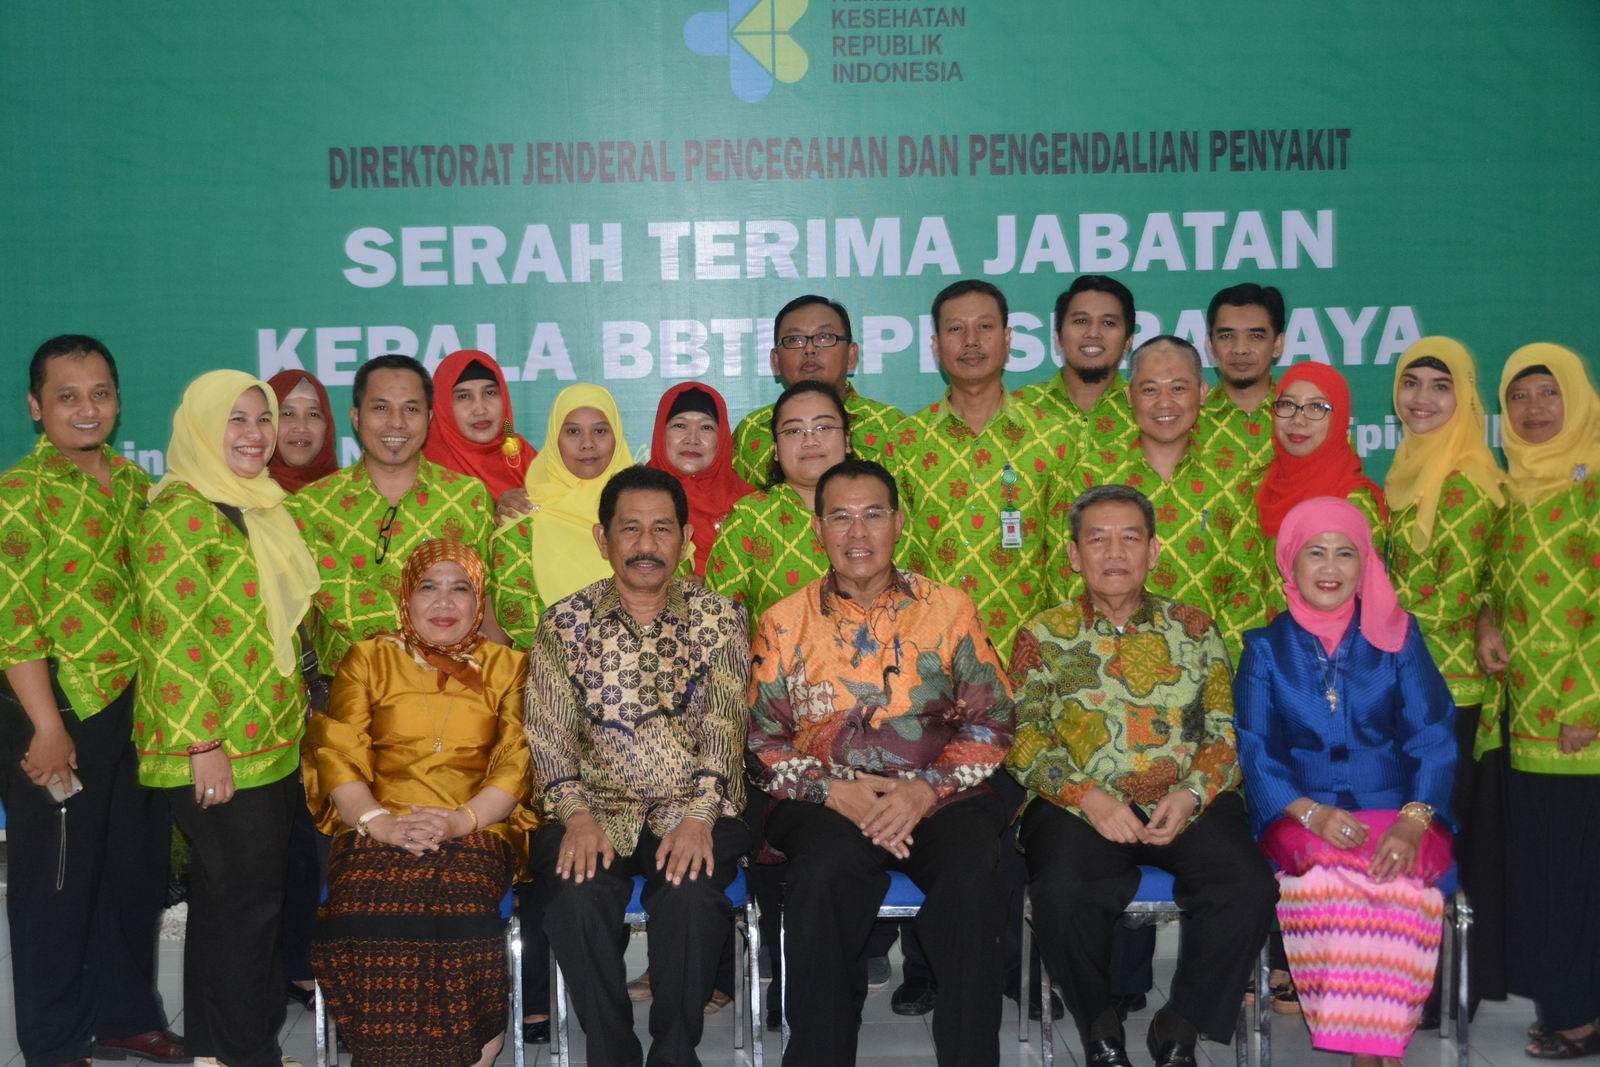 Sertijab Kepala BBTKLPP Surabaya